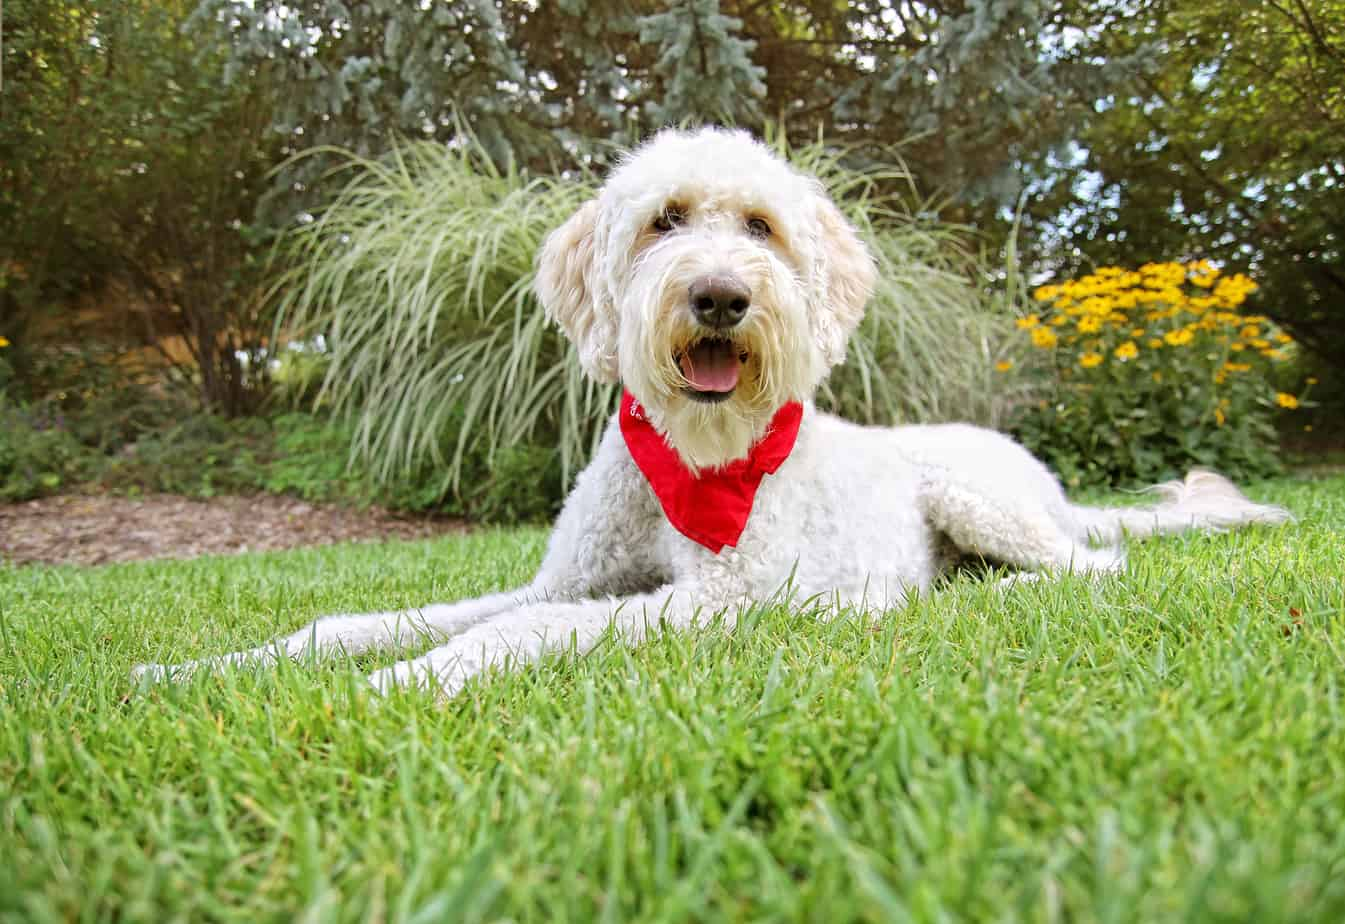 can a Goldendoodle make a good service dog